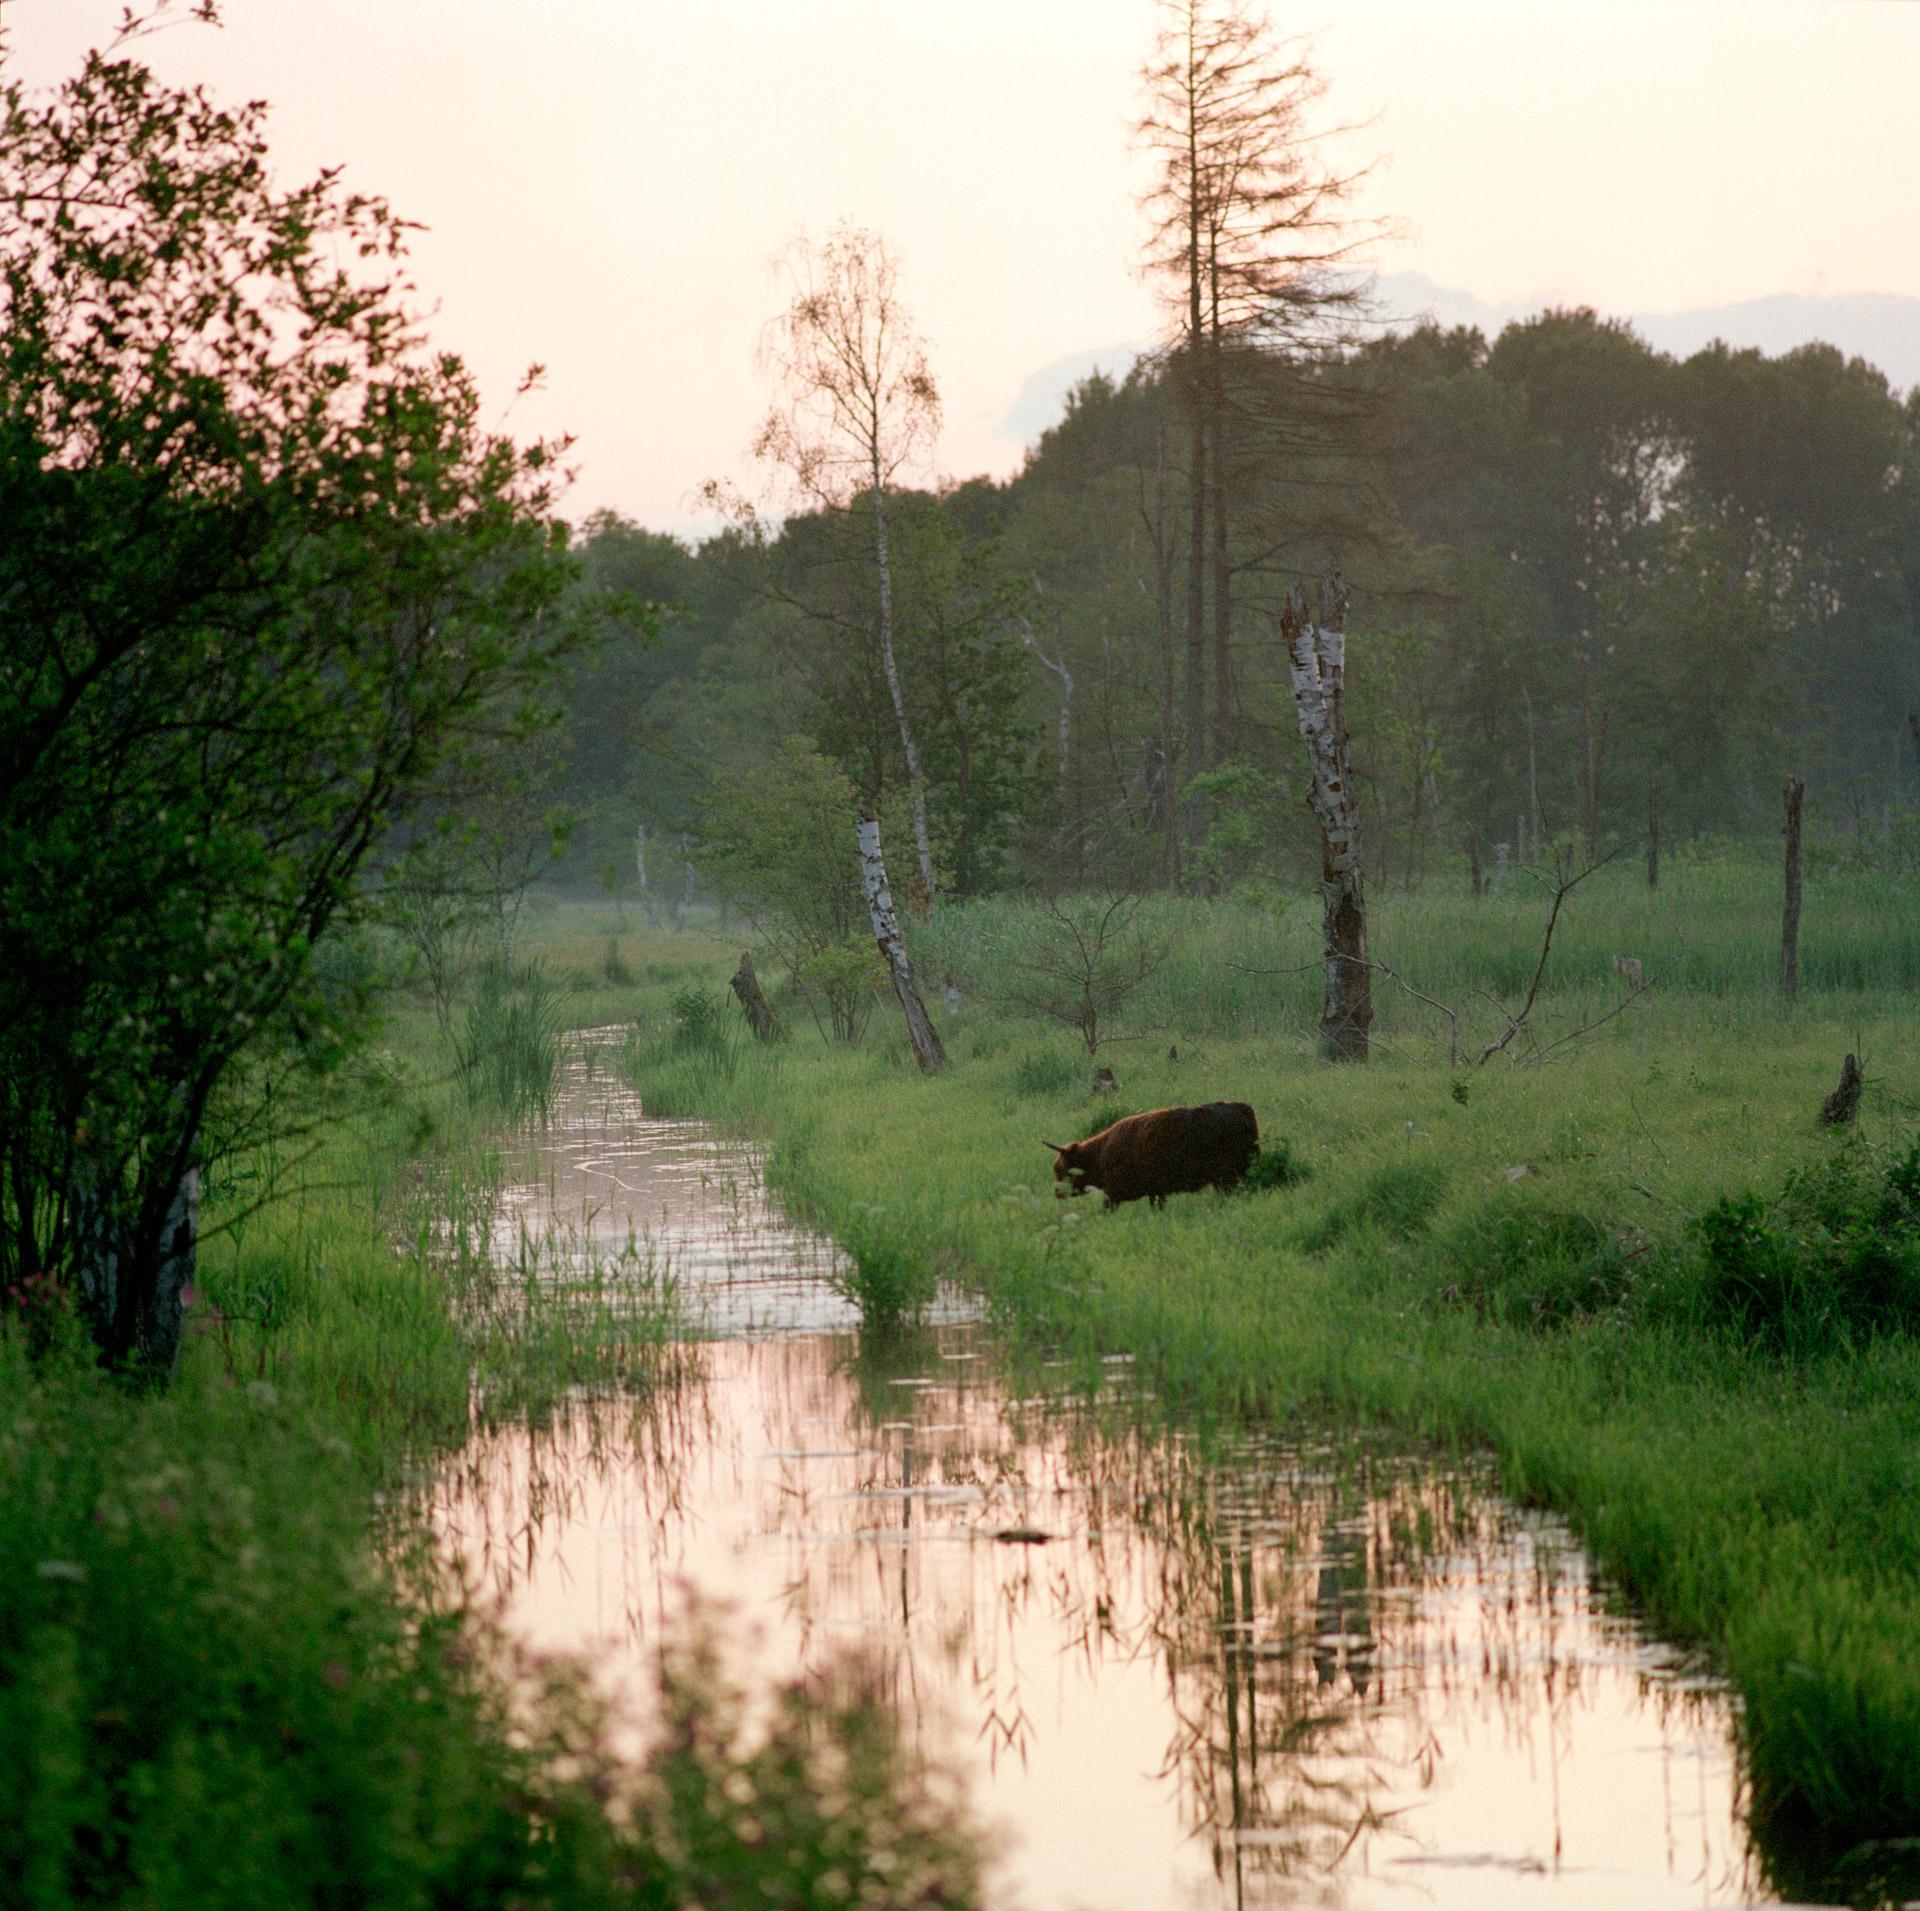 Cattle Klevad mølleåen